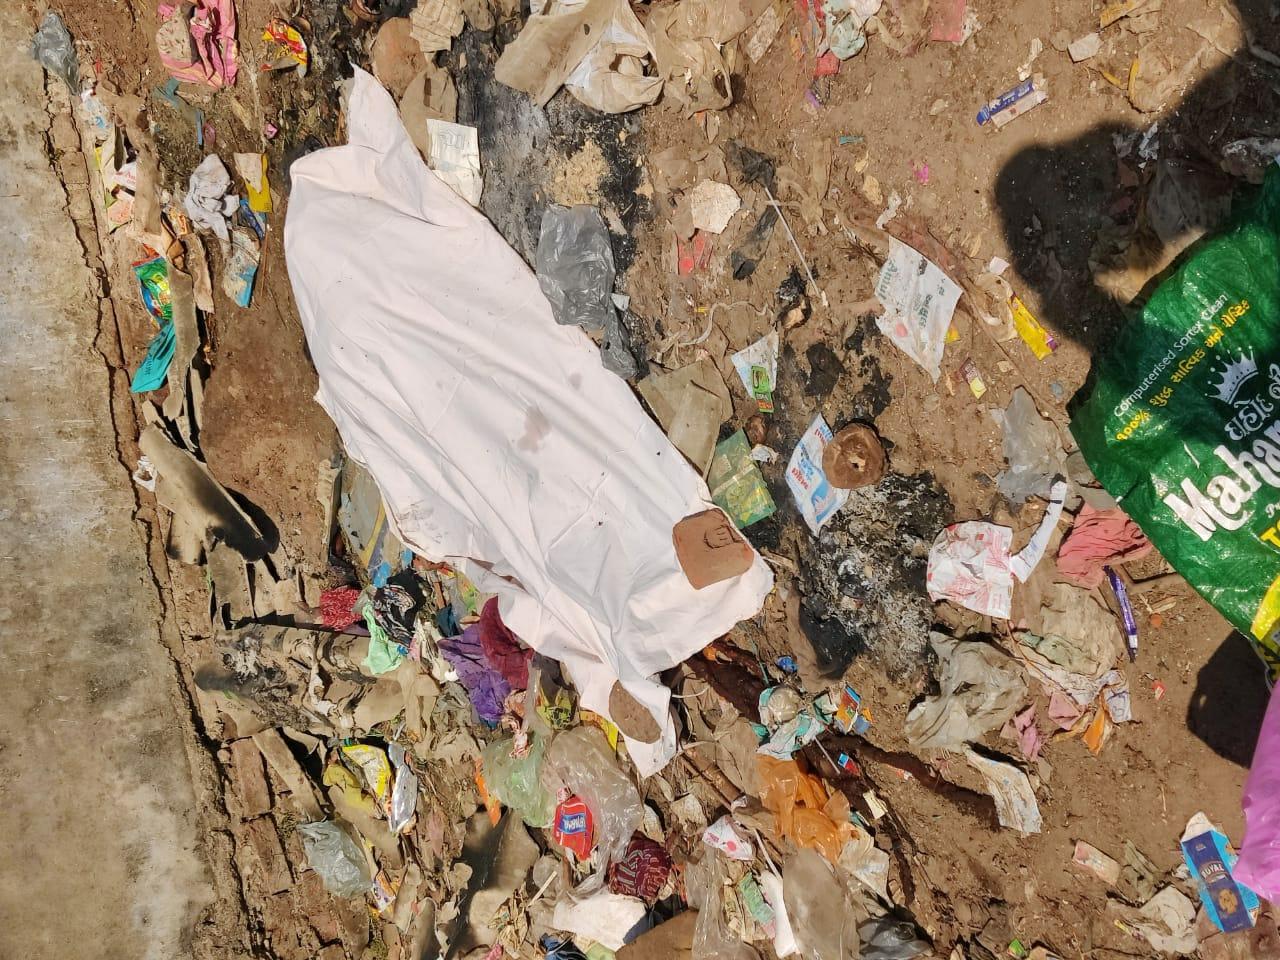 "#Vadodara - જે કુખે જન્મ લીધો તે માતાની જ પુત્રએ હત્યા કરી, કચરાના ઢગલામાં લાશને સળગાવી અને ત્યાં જ ઉભા રહીં ""ૐ નમઃ શિવાય"" ના જાપ કર્યા"